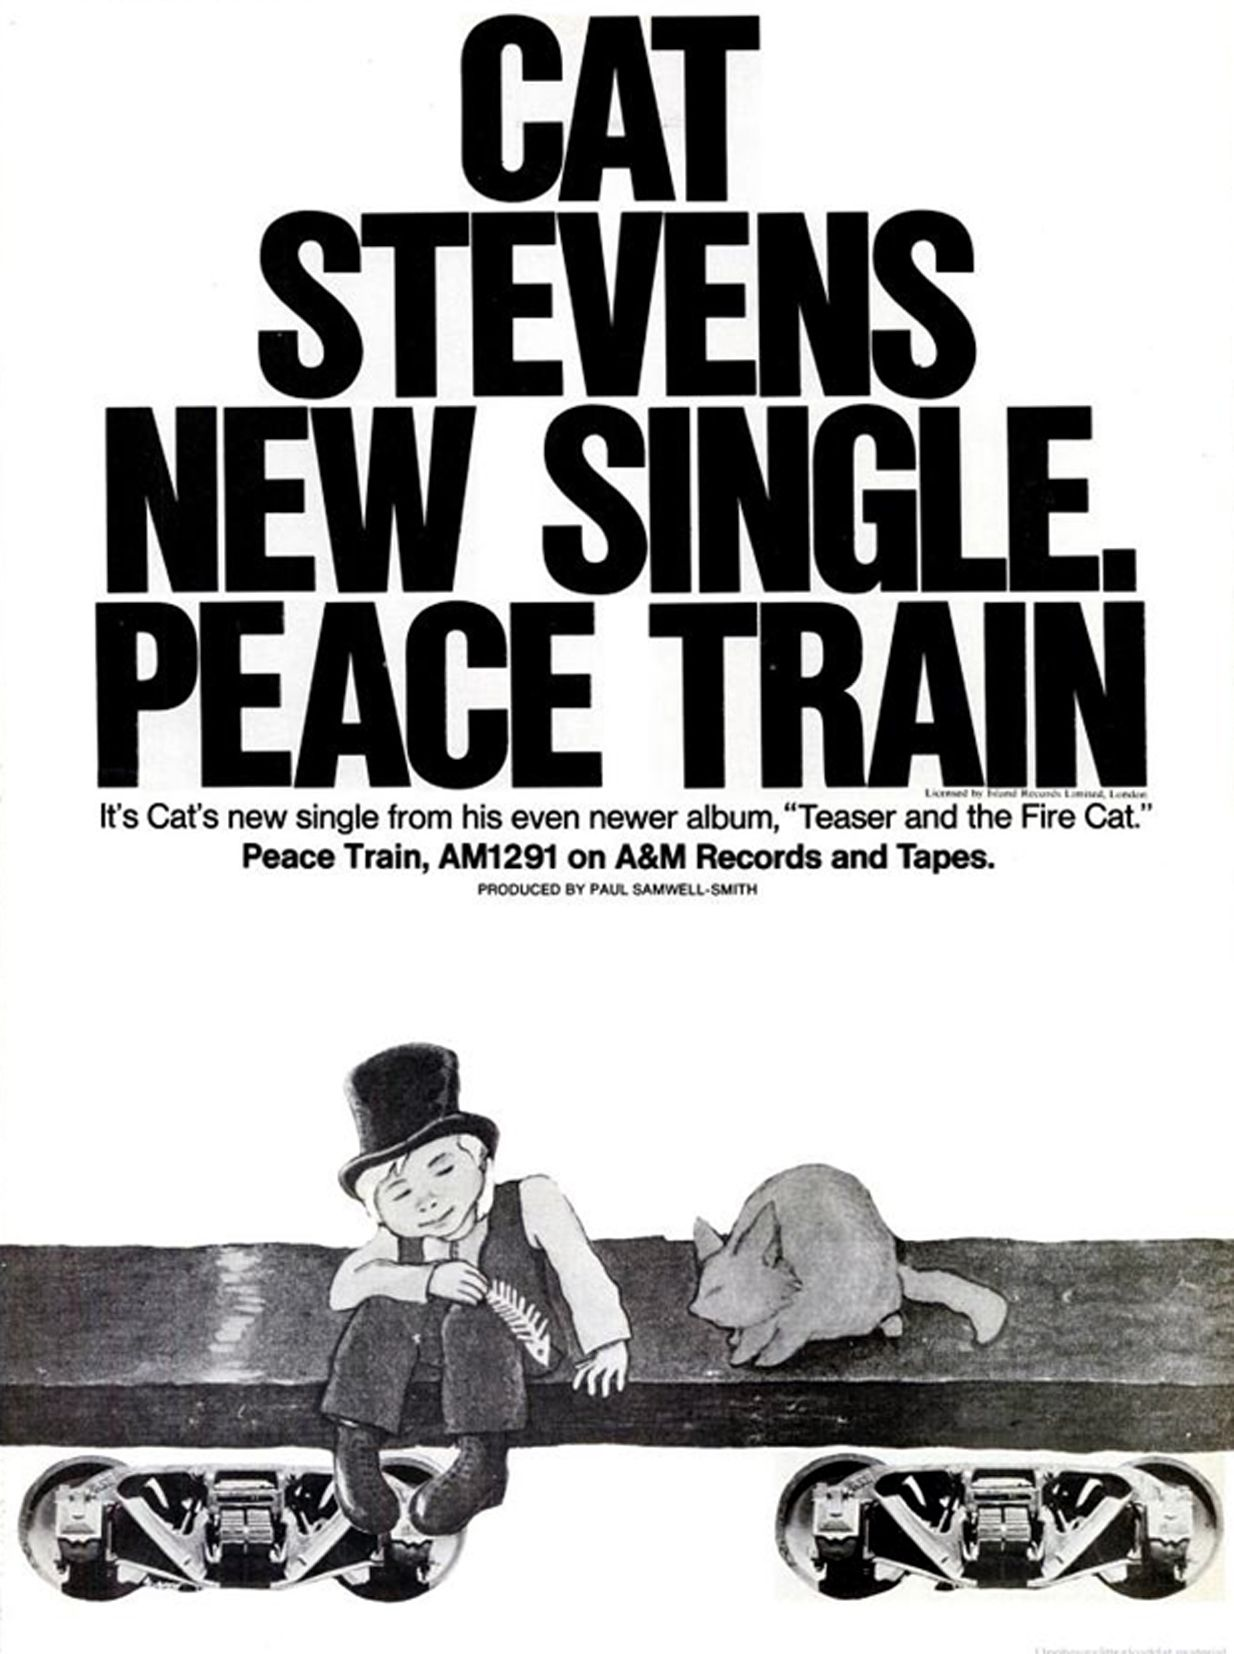 Cat Stevens Billboard Magazine Advertise 1971 Music